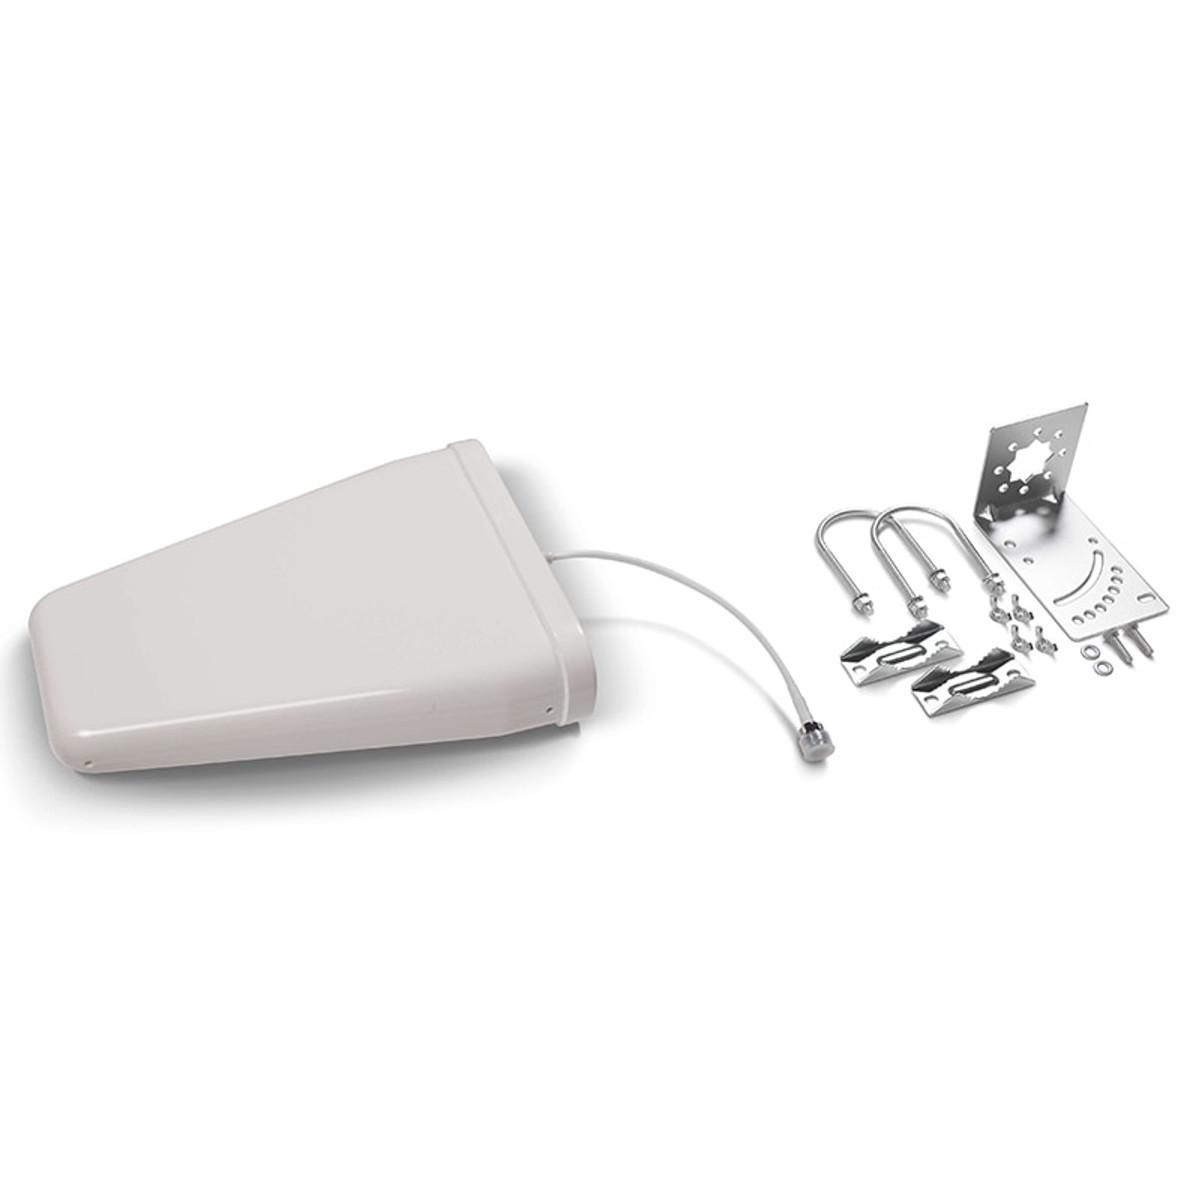 Wilson Wideband Yagi Directional Antenna, 50 Ohm, 617-2700 MHz | 311233